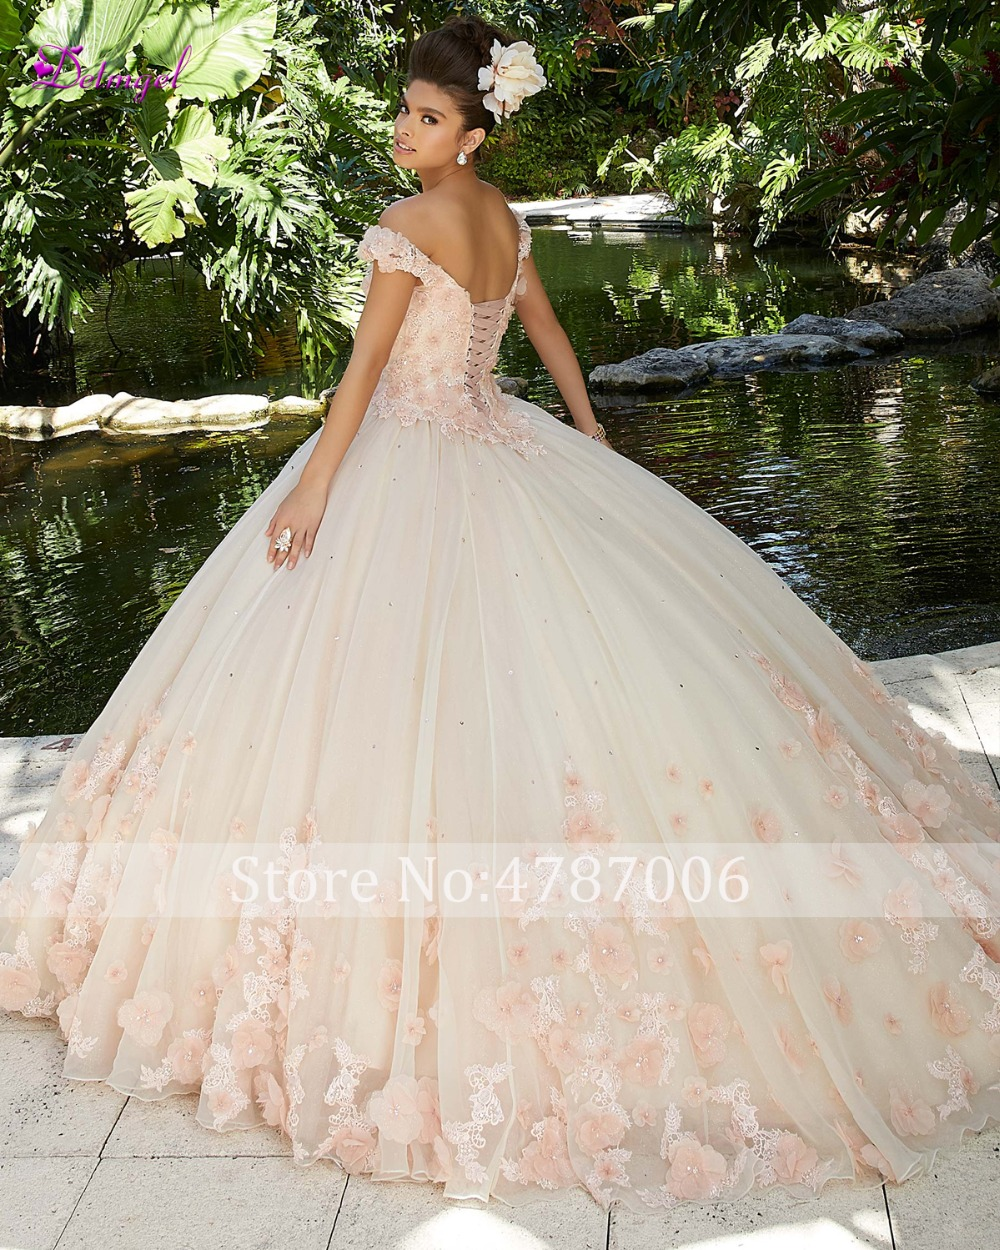 Detmgel Sexy bateau cou perlé fleurs robe de bal Quinceanera robes 2019 de luxe Appliques Debutante robe pour Vestido de 15 anos - 2